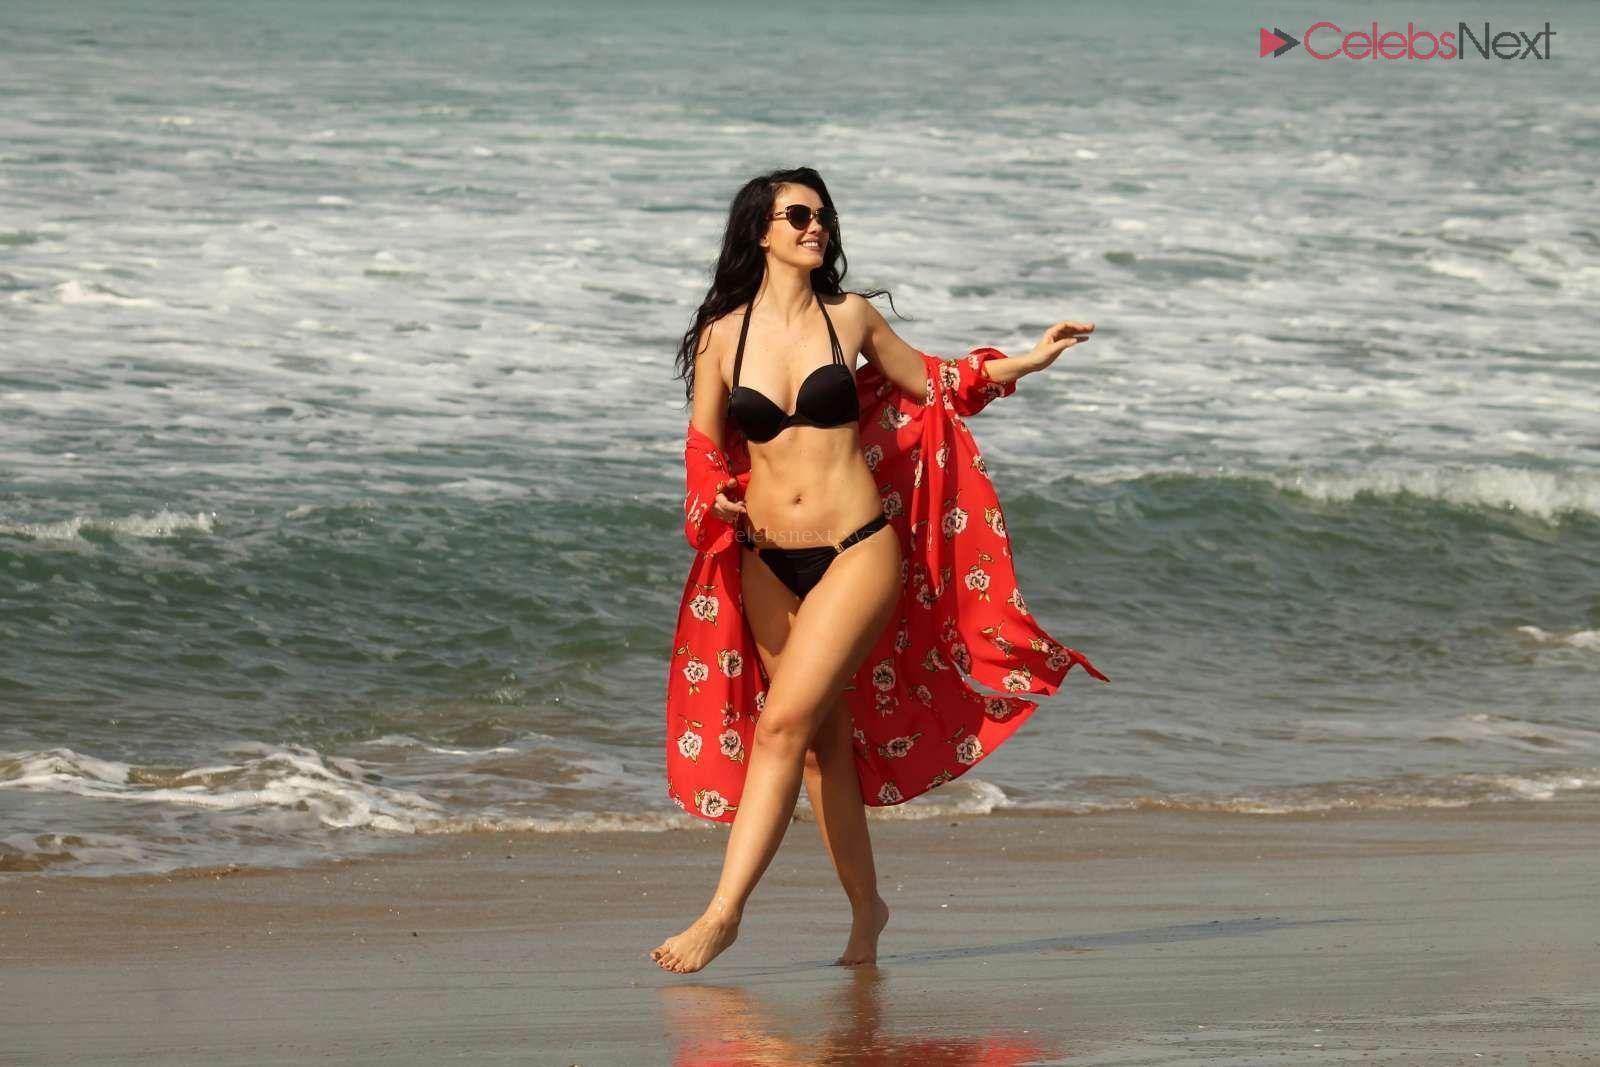 Natasha+Blasick+Creamy+body+enjoying+in+Black+Bikini+at+a+beach+in+Malibu+-+celebritybooty.co+Exclusive+001.jpg